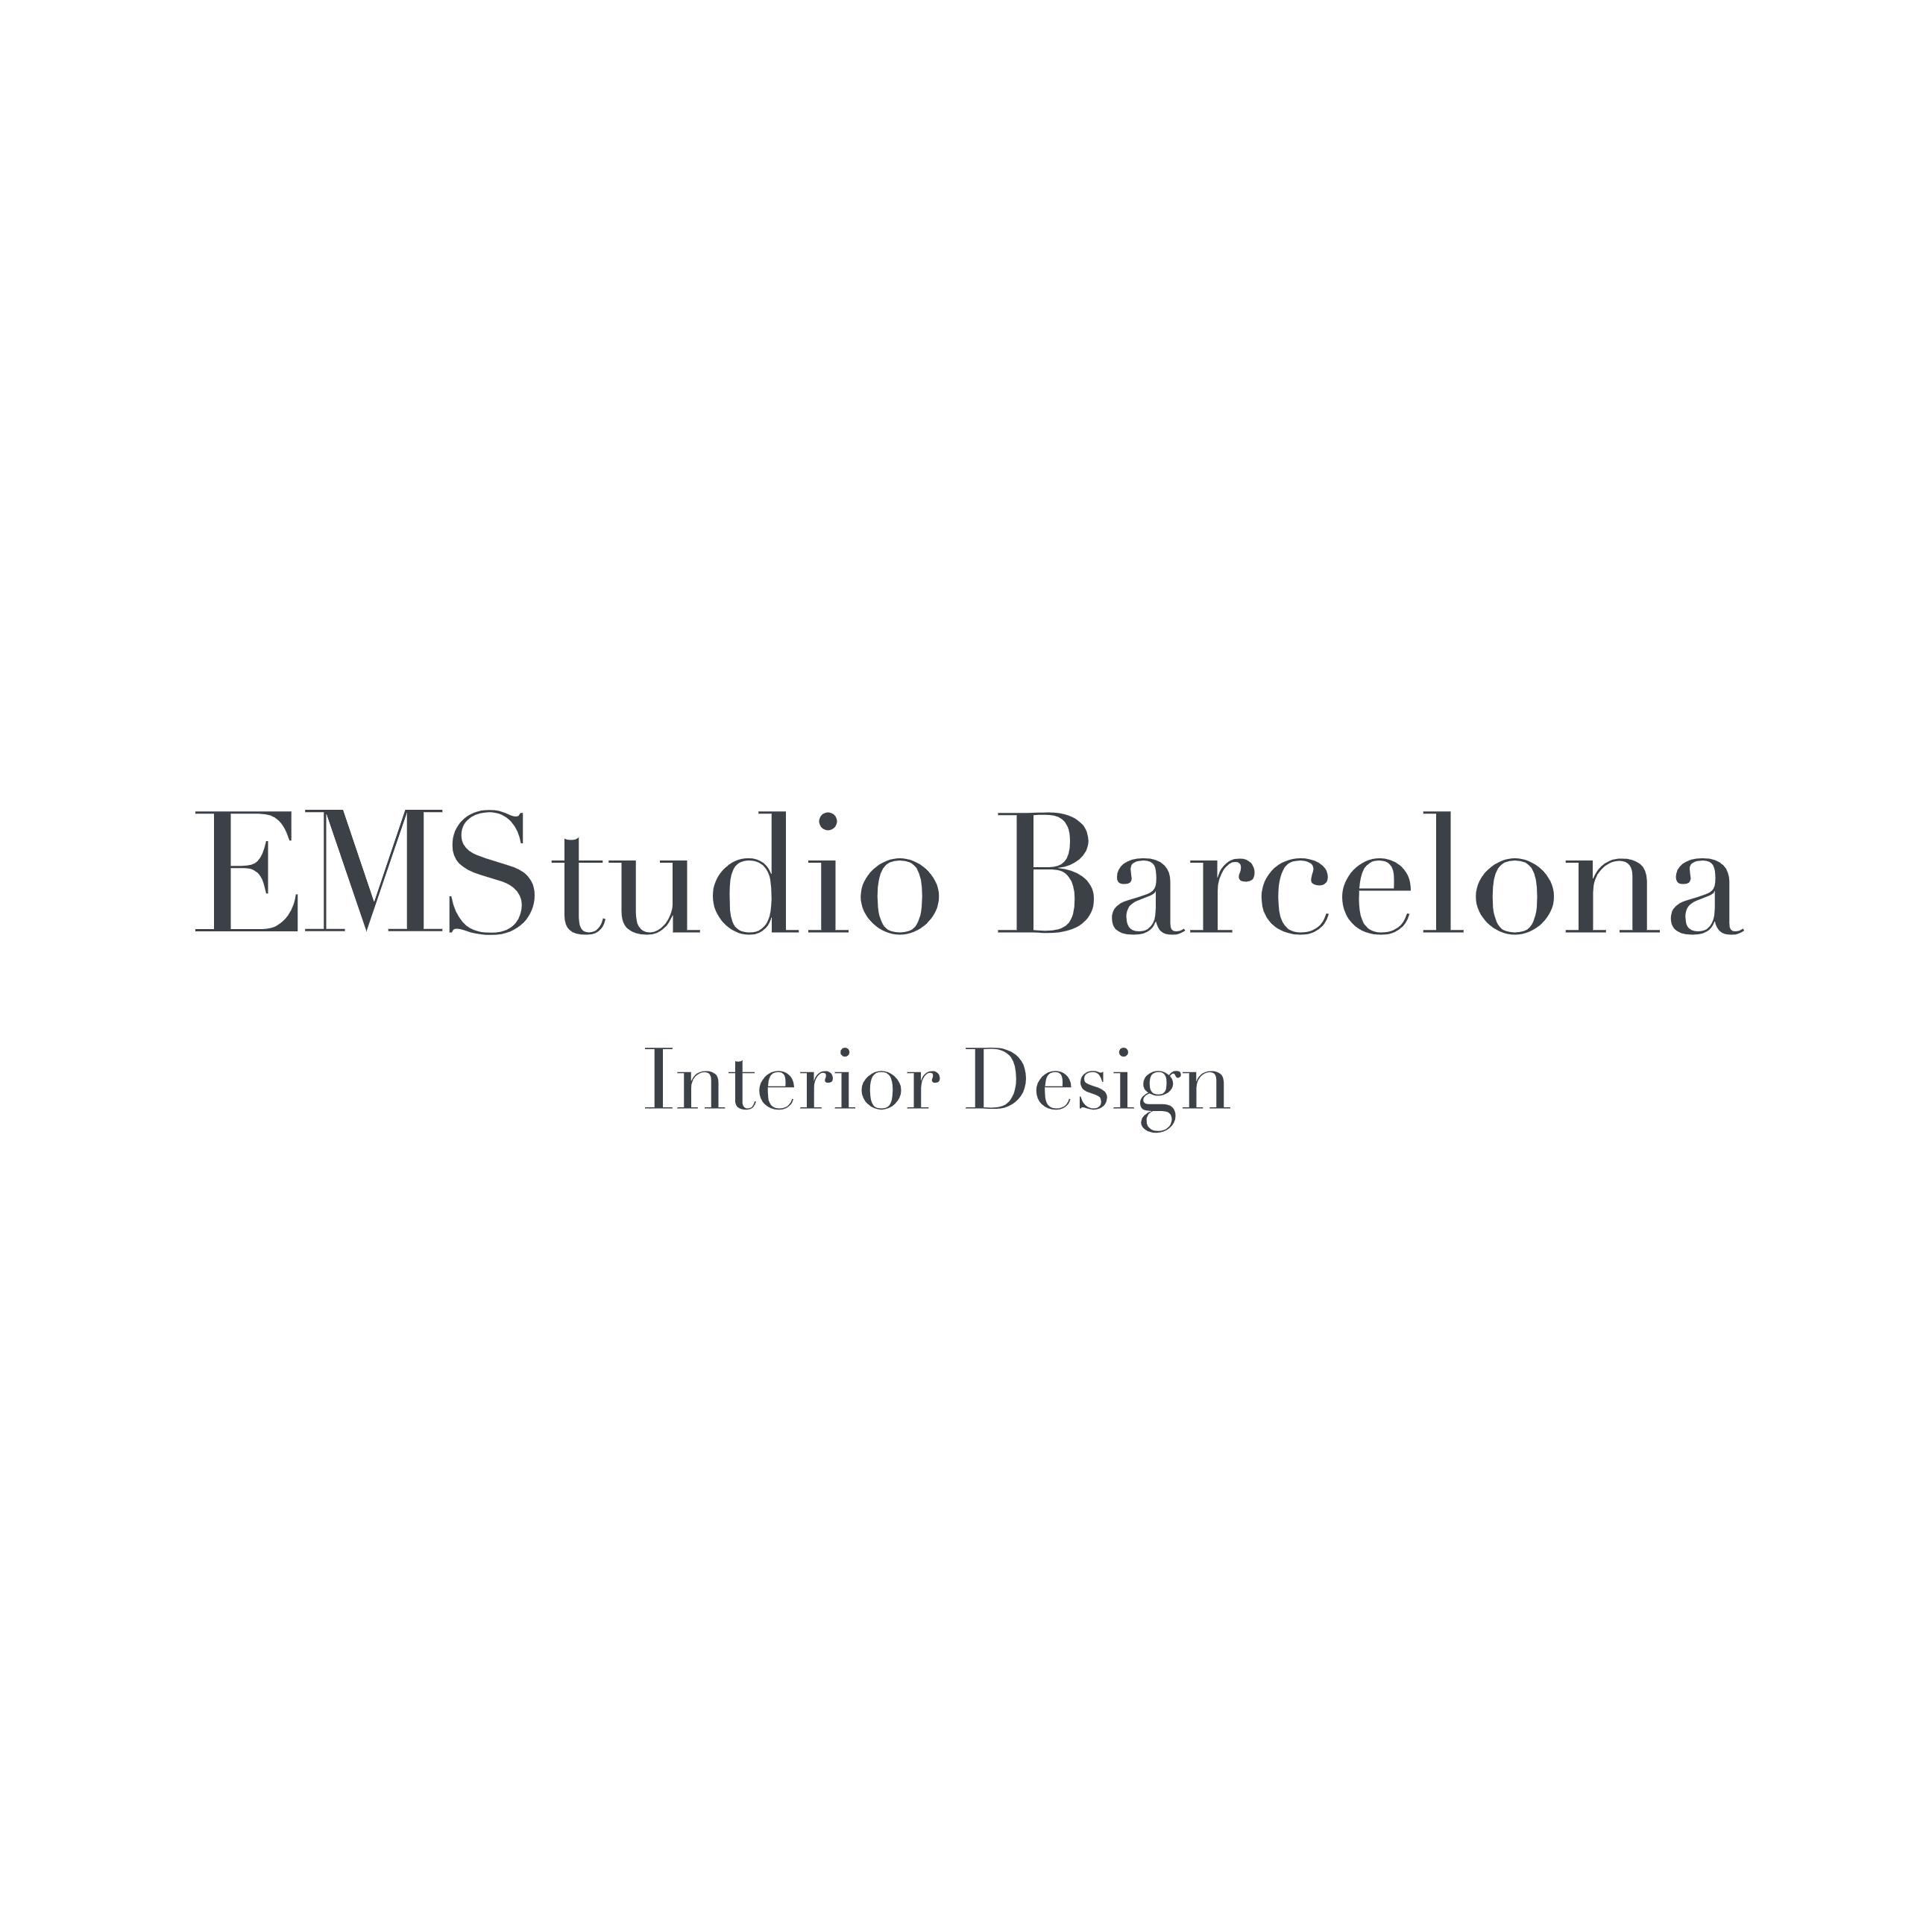 EMStudioBarcelona logo